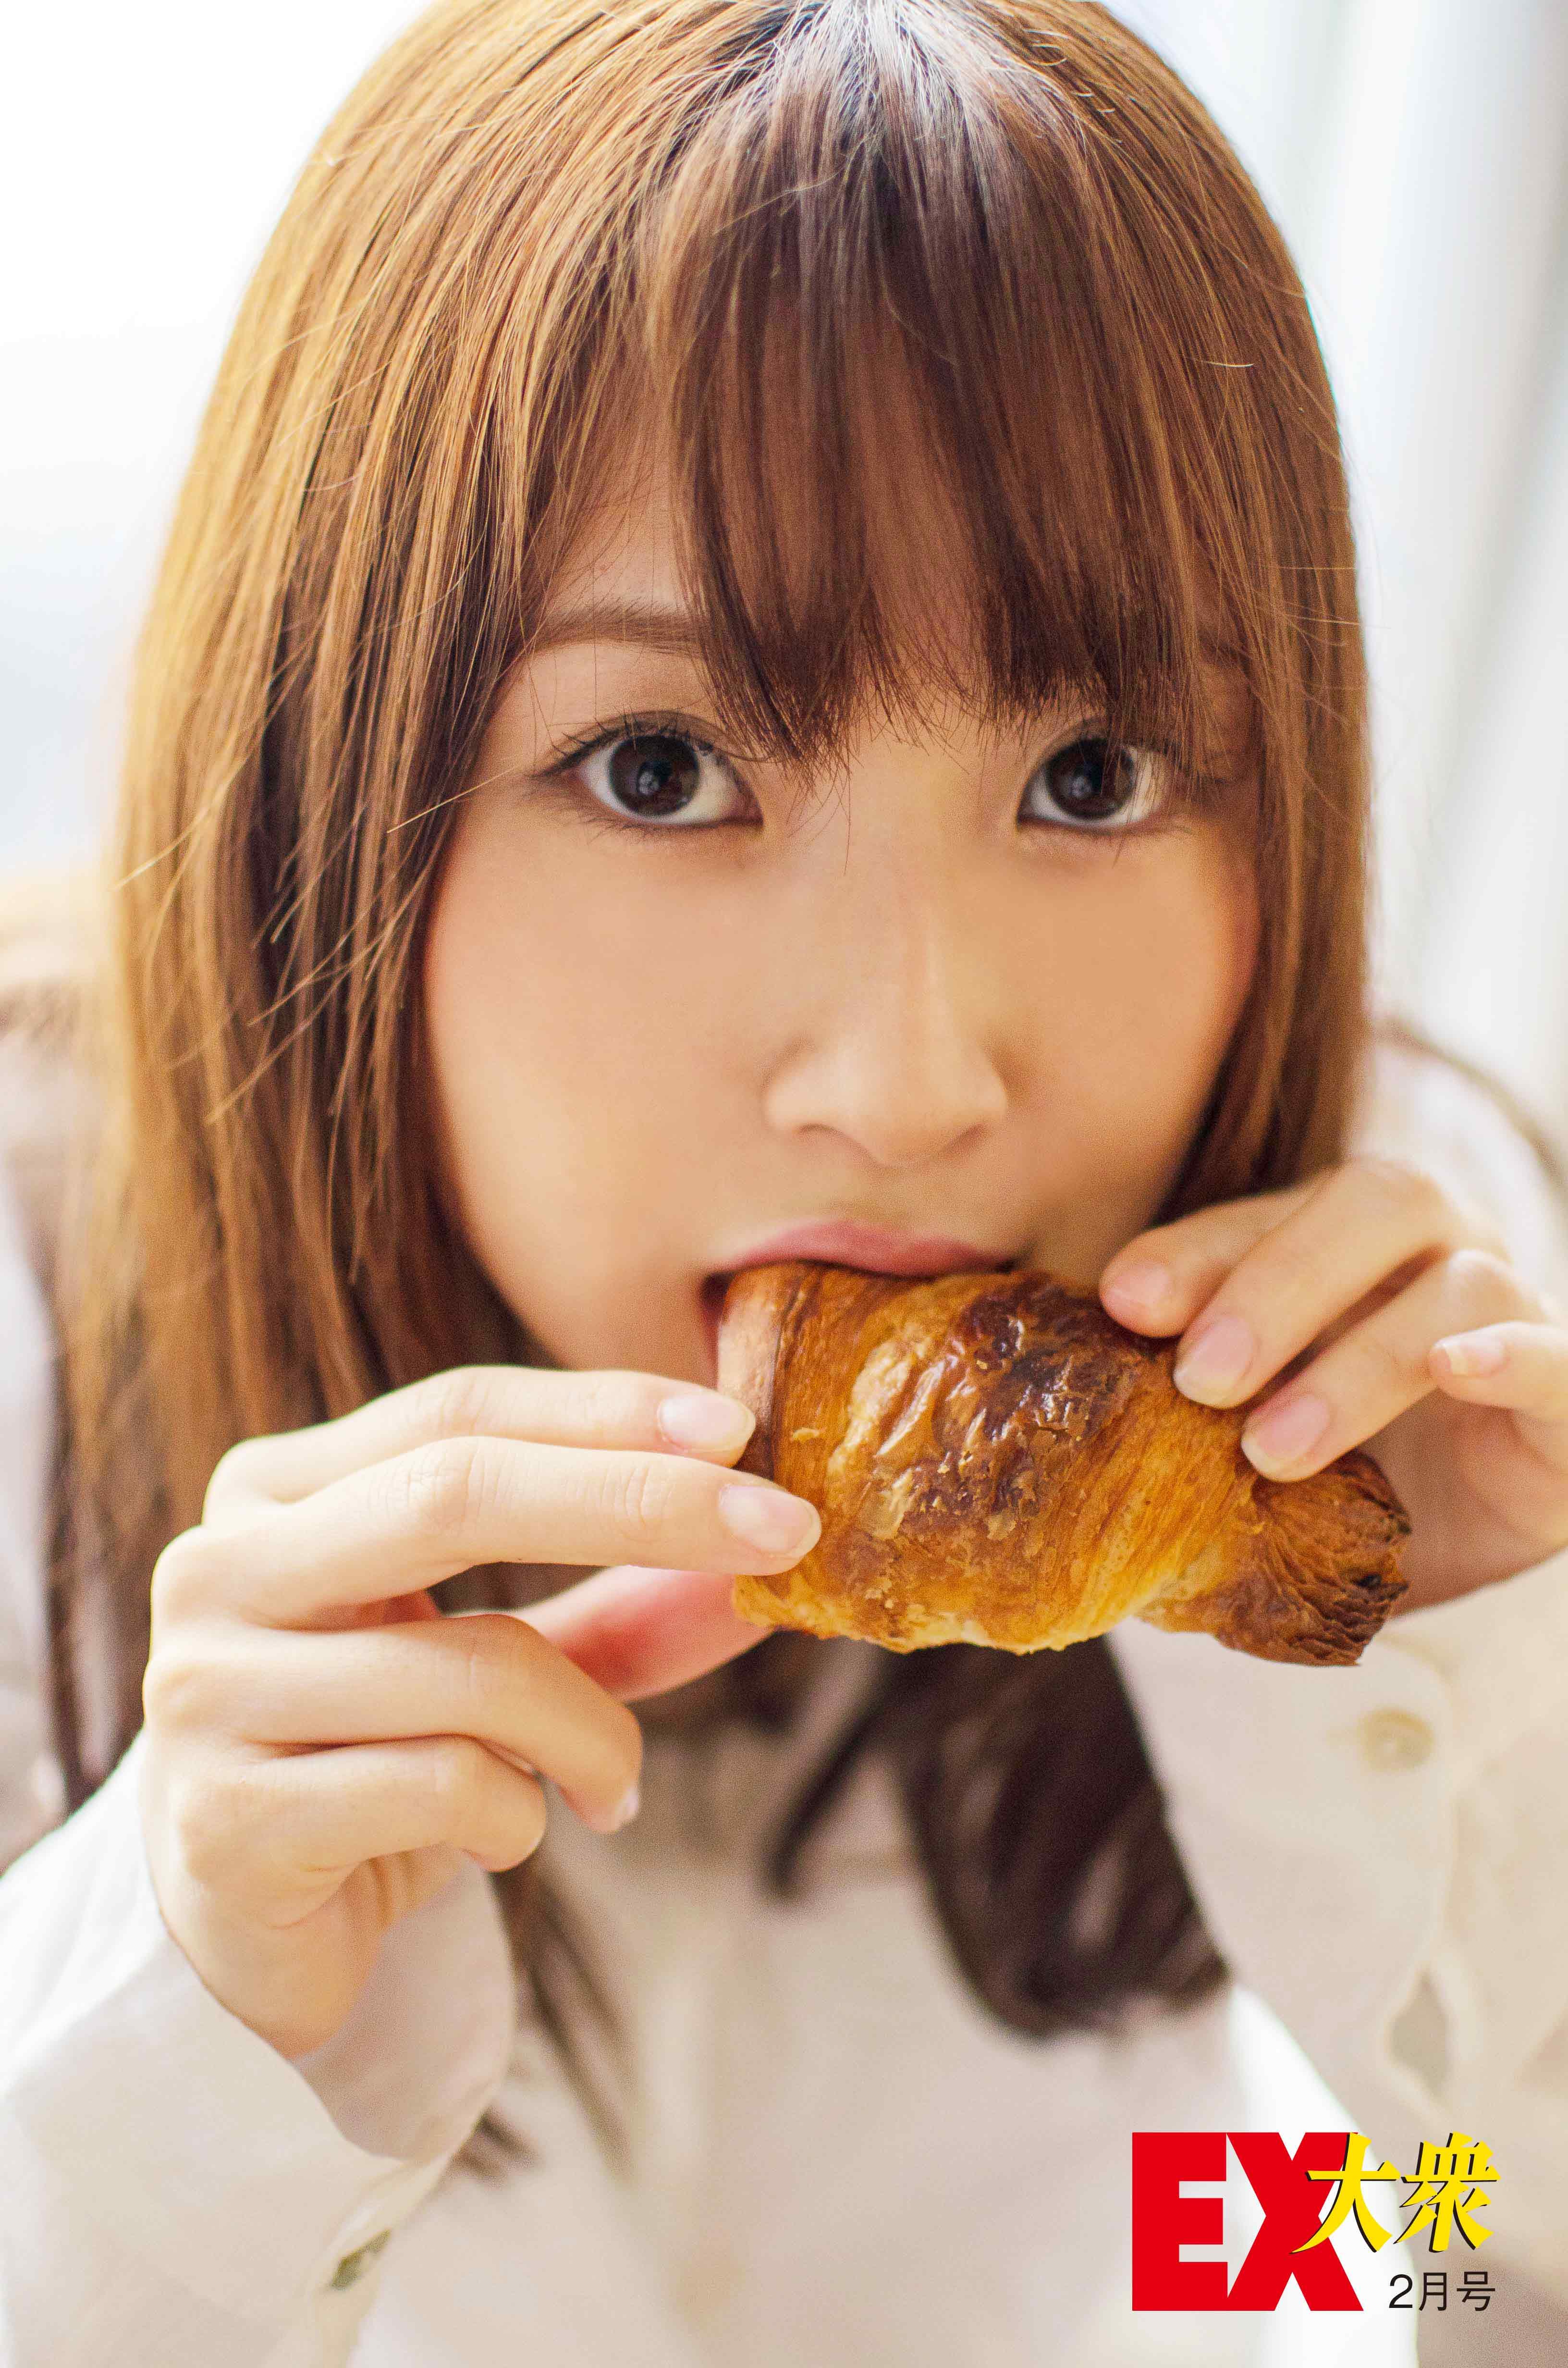 SKE48高柳明音の本誌未掲載カット5枚を大公開!【EX大衆2月号】の画像002